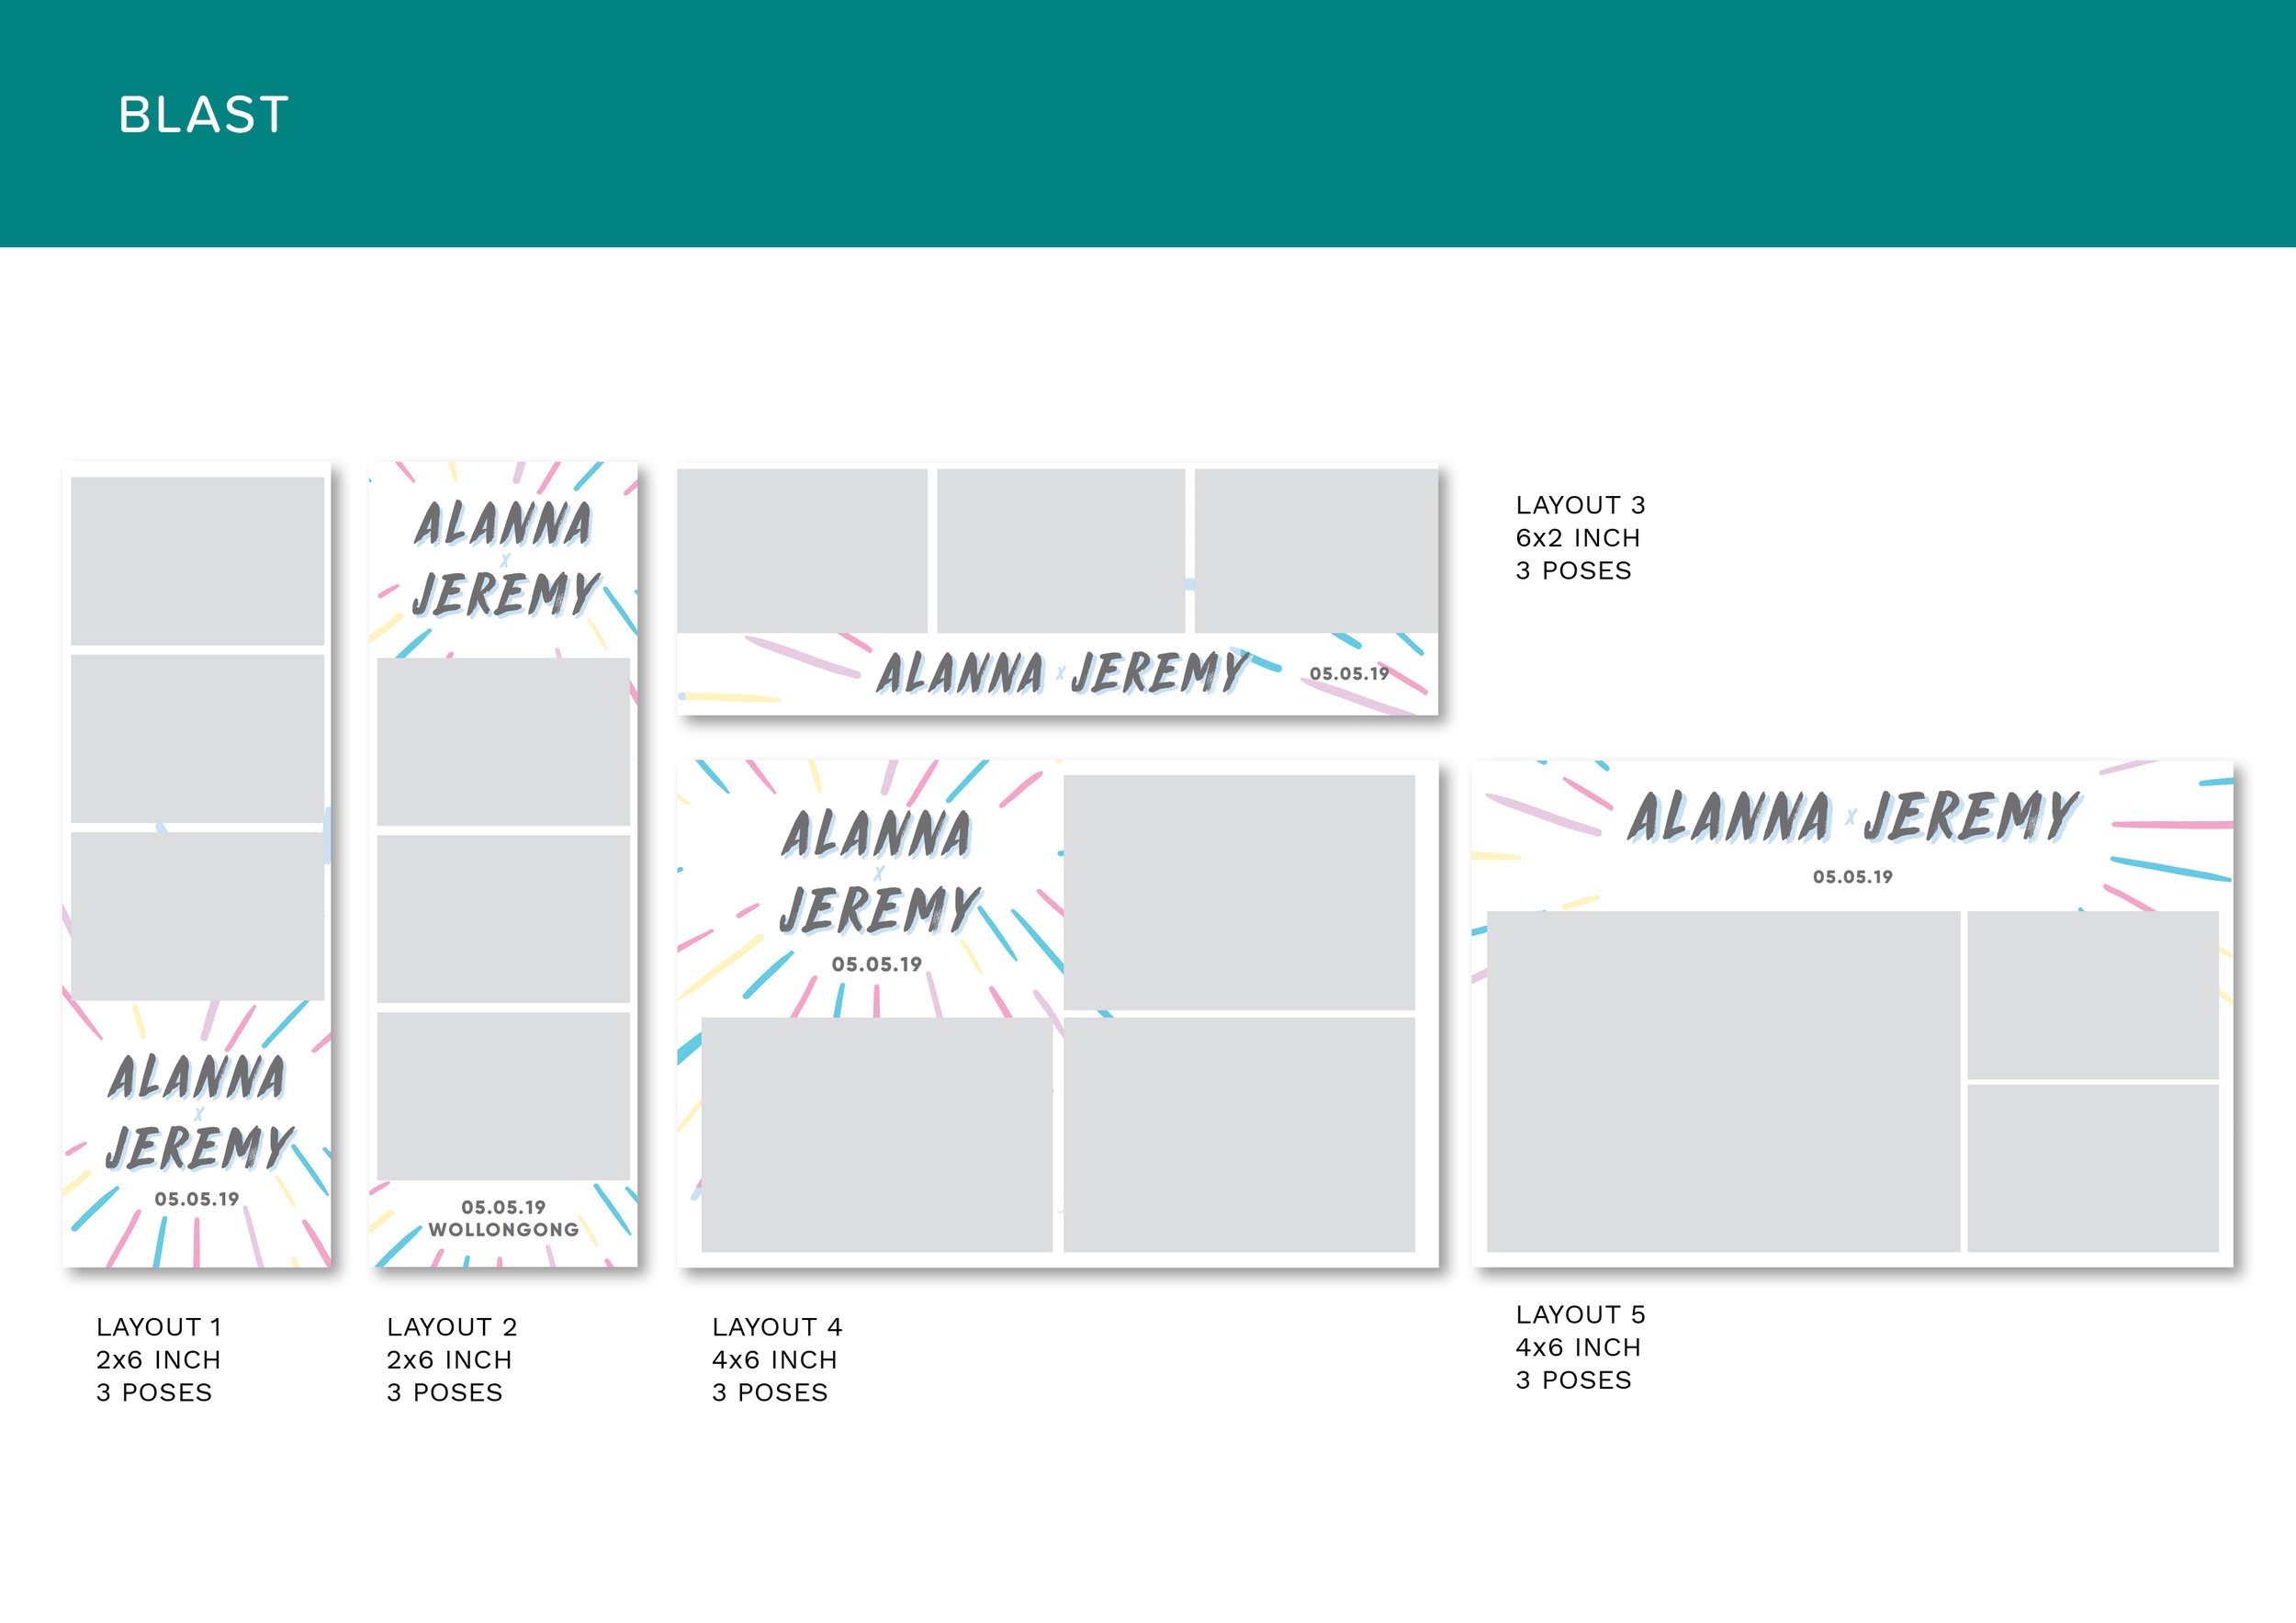 photo-corner-photo-booth-print-blast.jpg